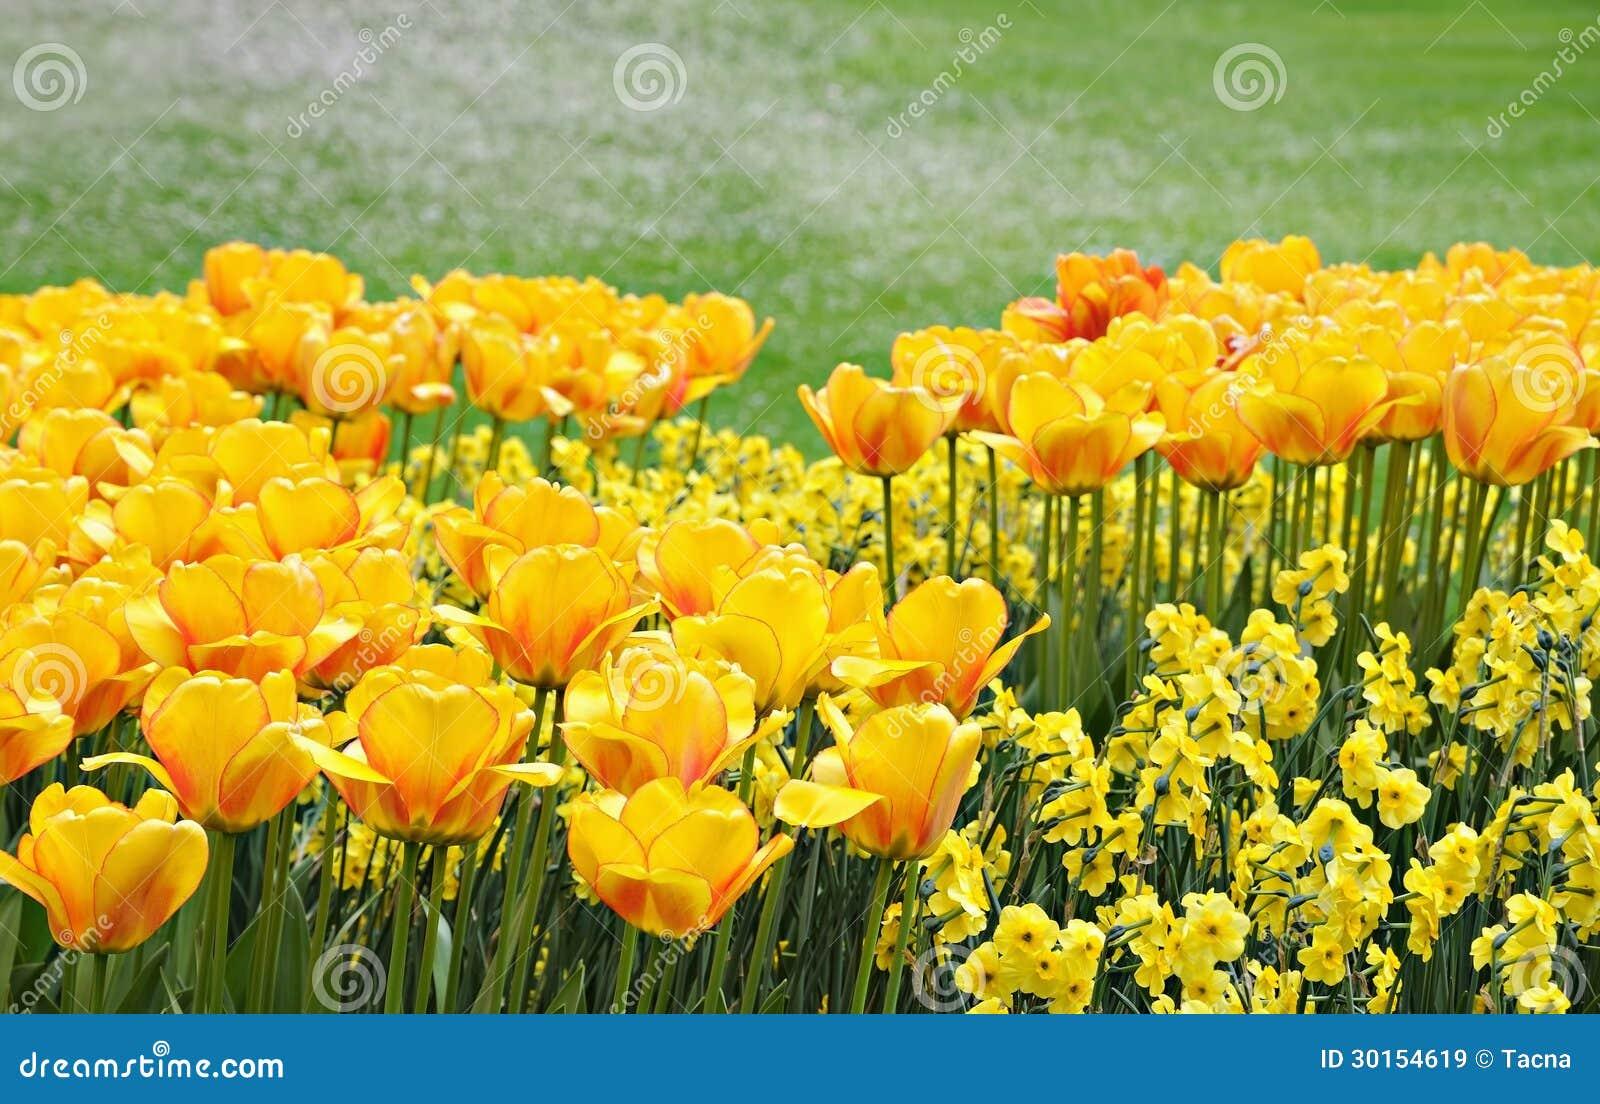 jardin jaune de fleurs au printemps image stock image 30154619. Black Bedroom Furniture Sets. Home Design Ideas